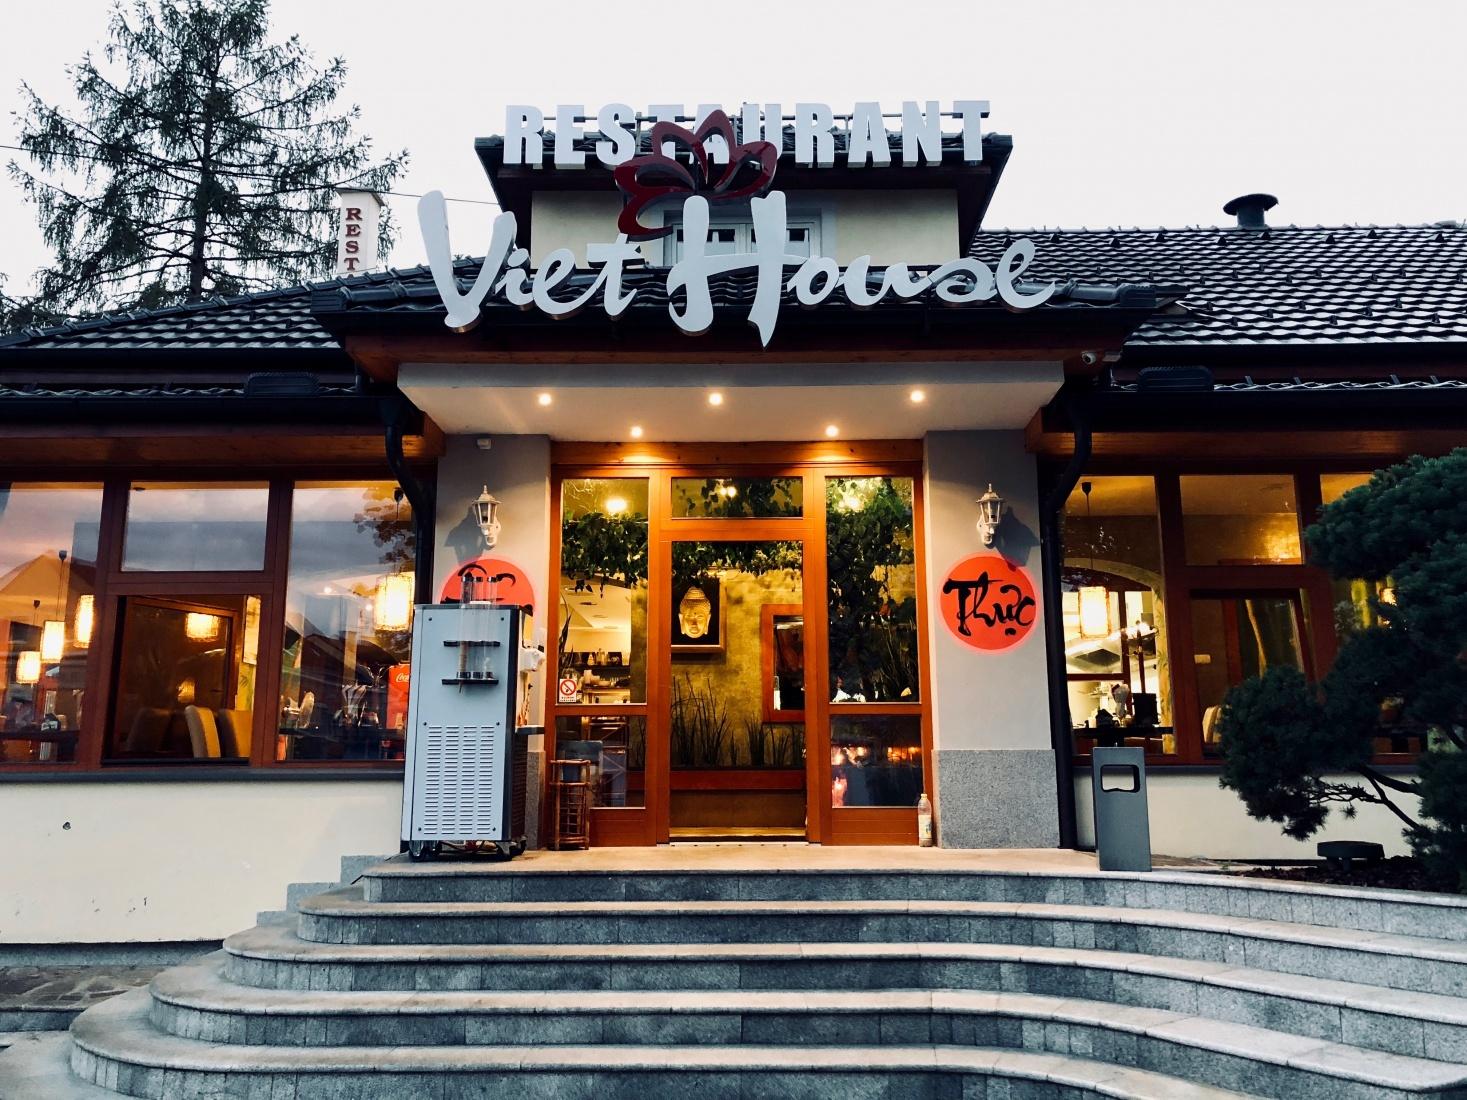 A Vietnamese restaurant in České Velenice, Czech Republic.